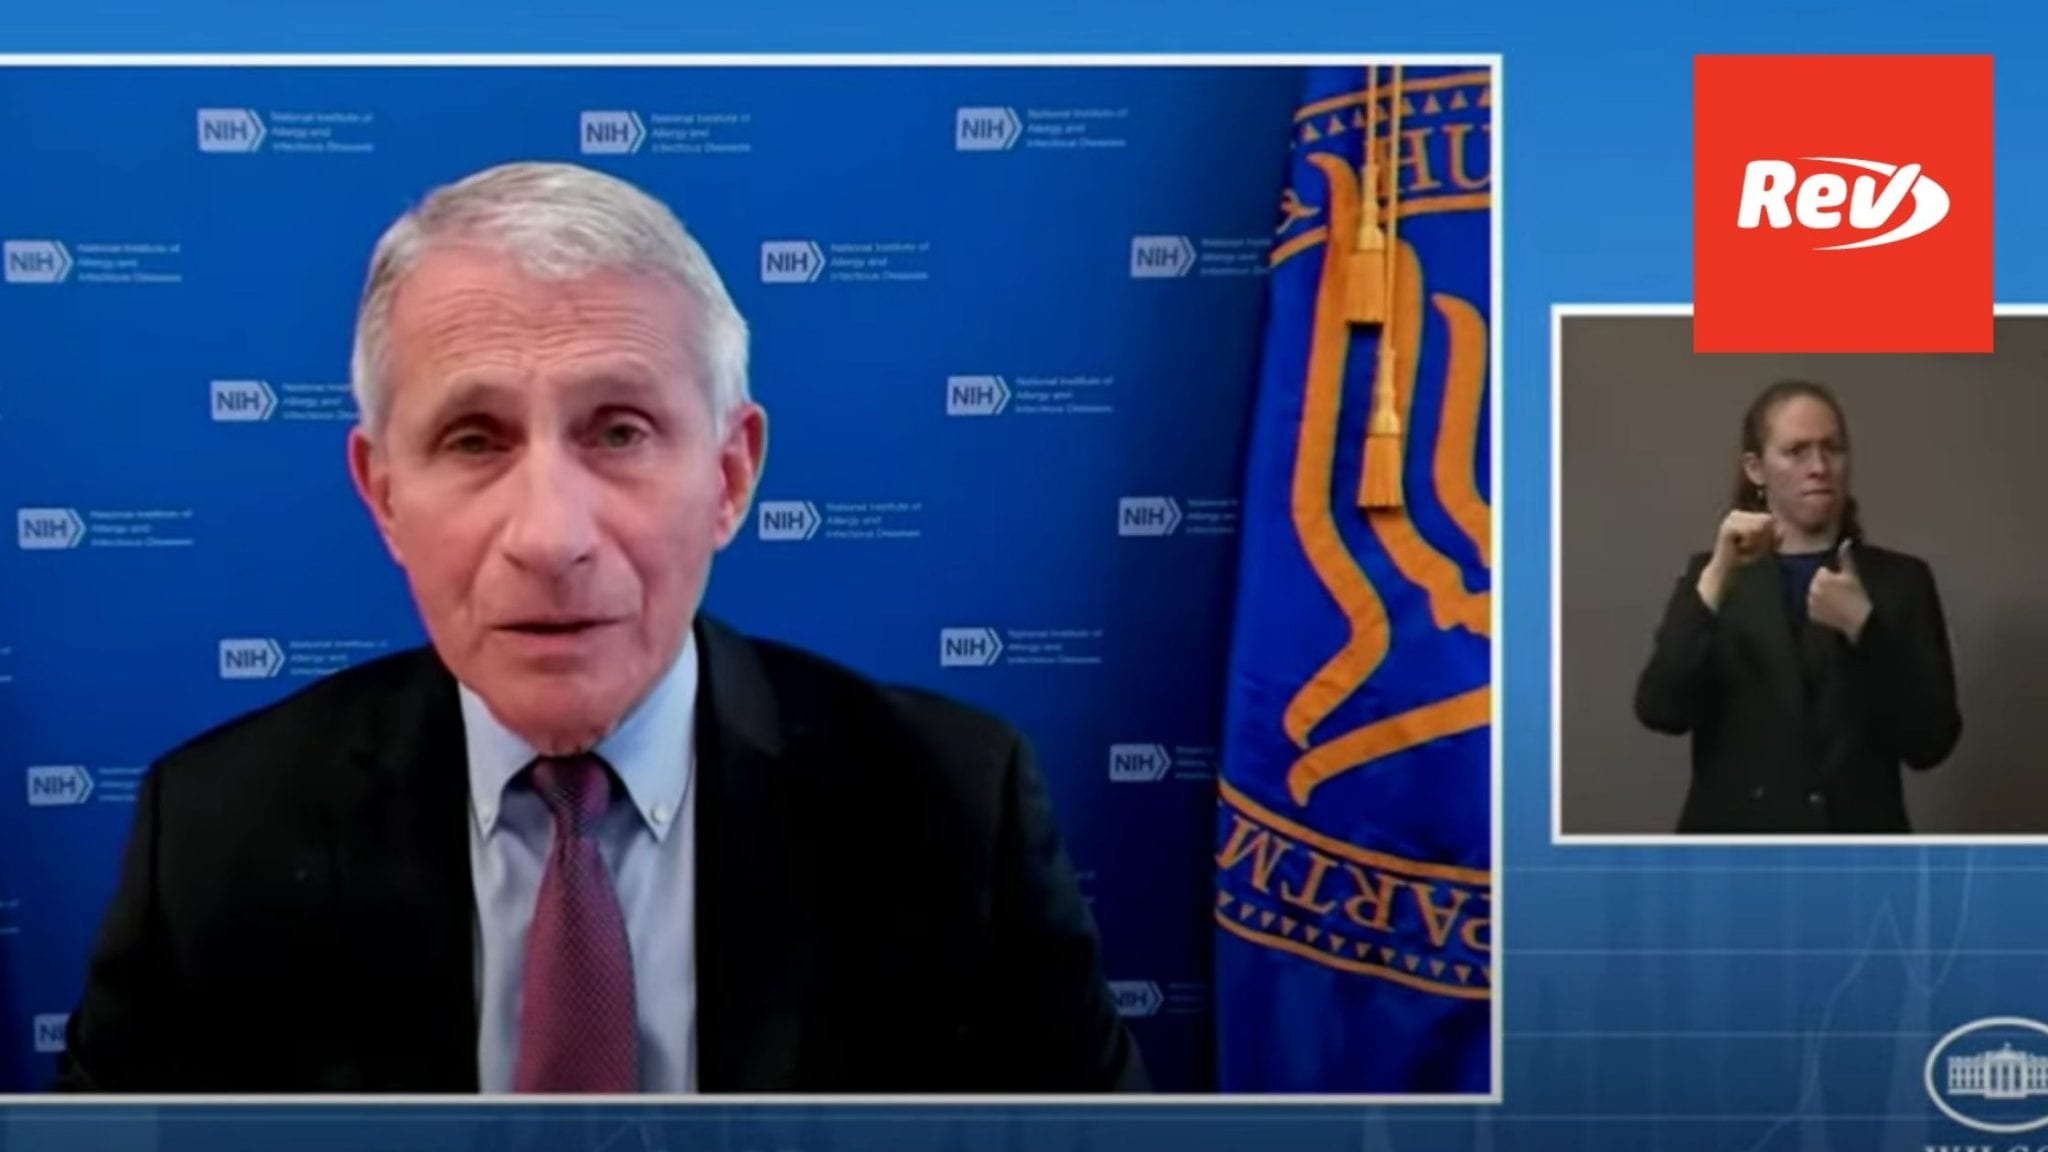 White House COVID-19 Task Force, Dr. Fauci Press Conference Transcript June 3